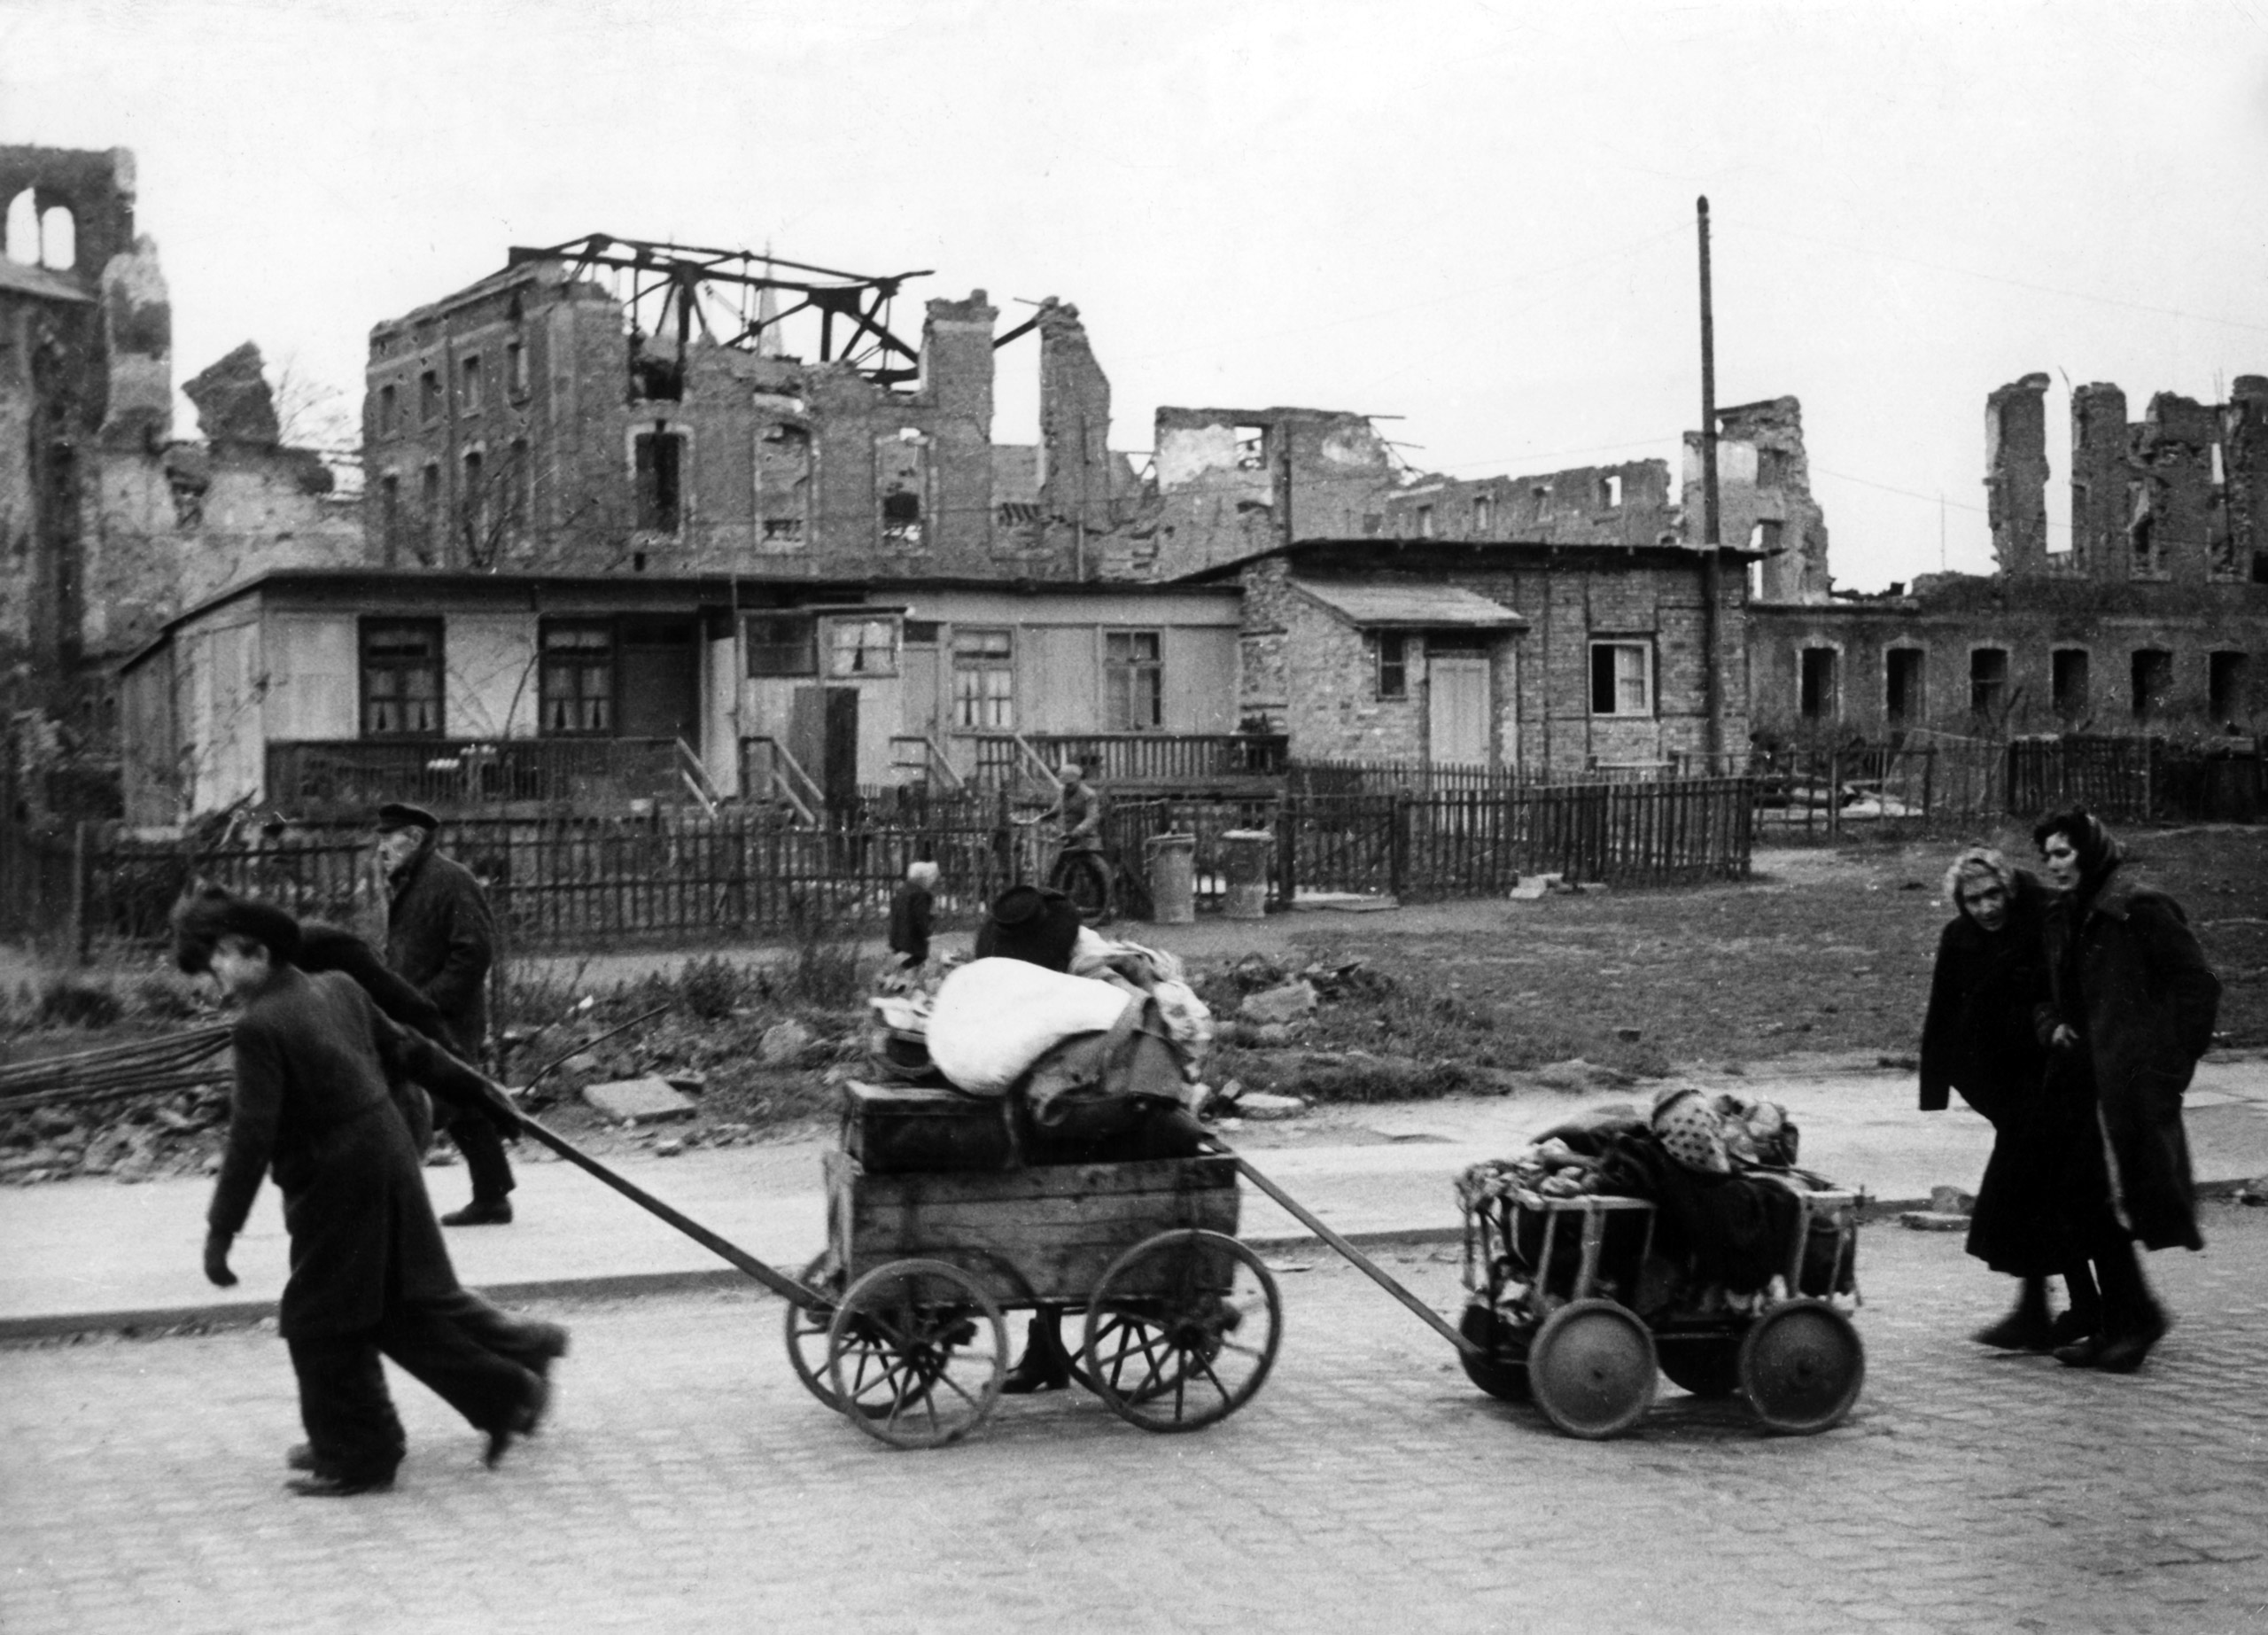 War refugees walking through Berlin with their belongings on Dec. 15, 1945.